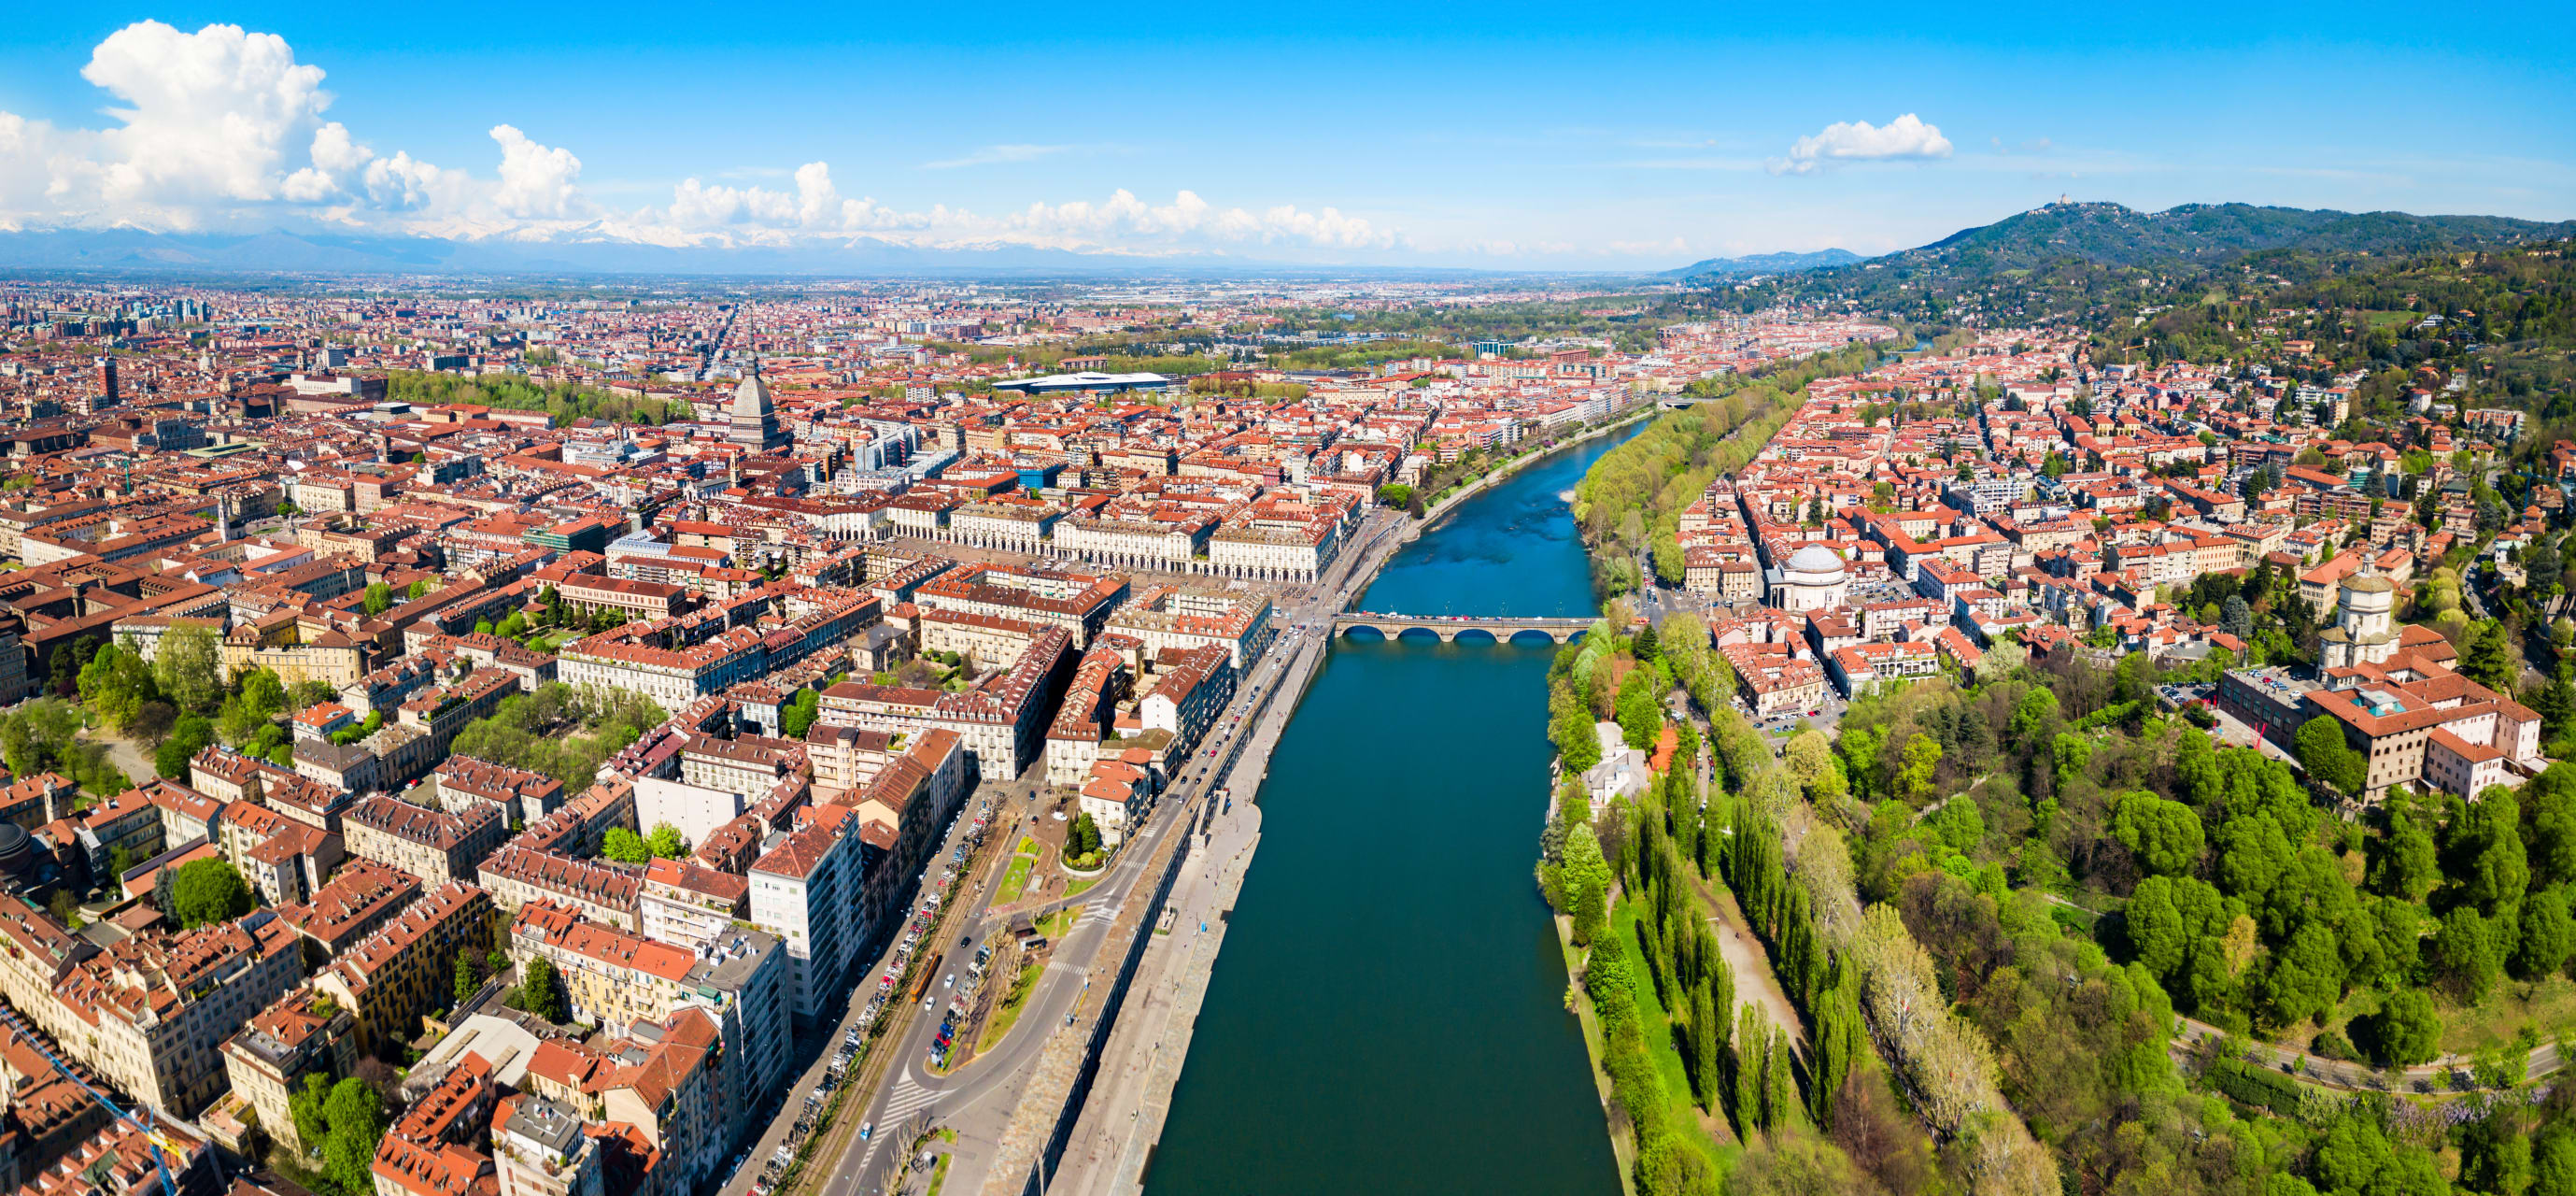 Piemonte - Discovering Torino: Between Present and Past